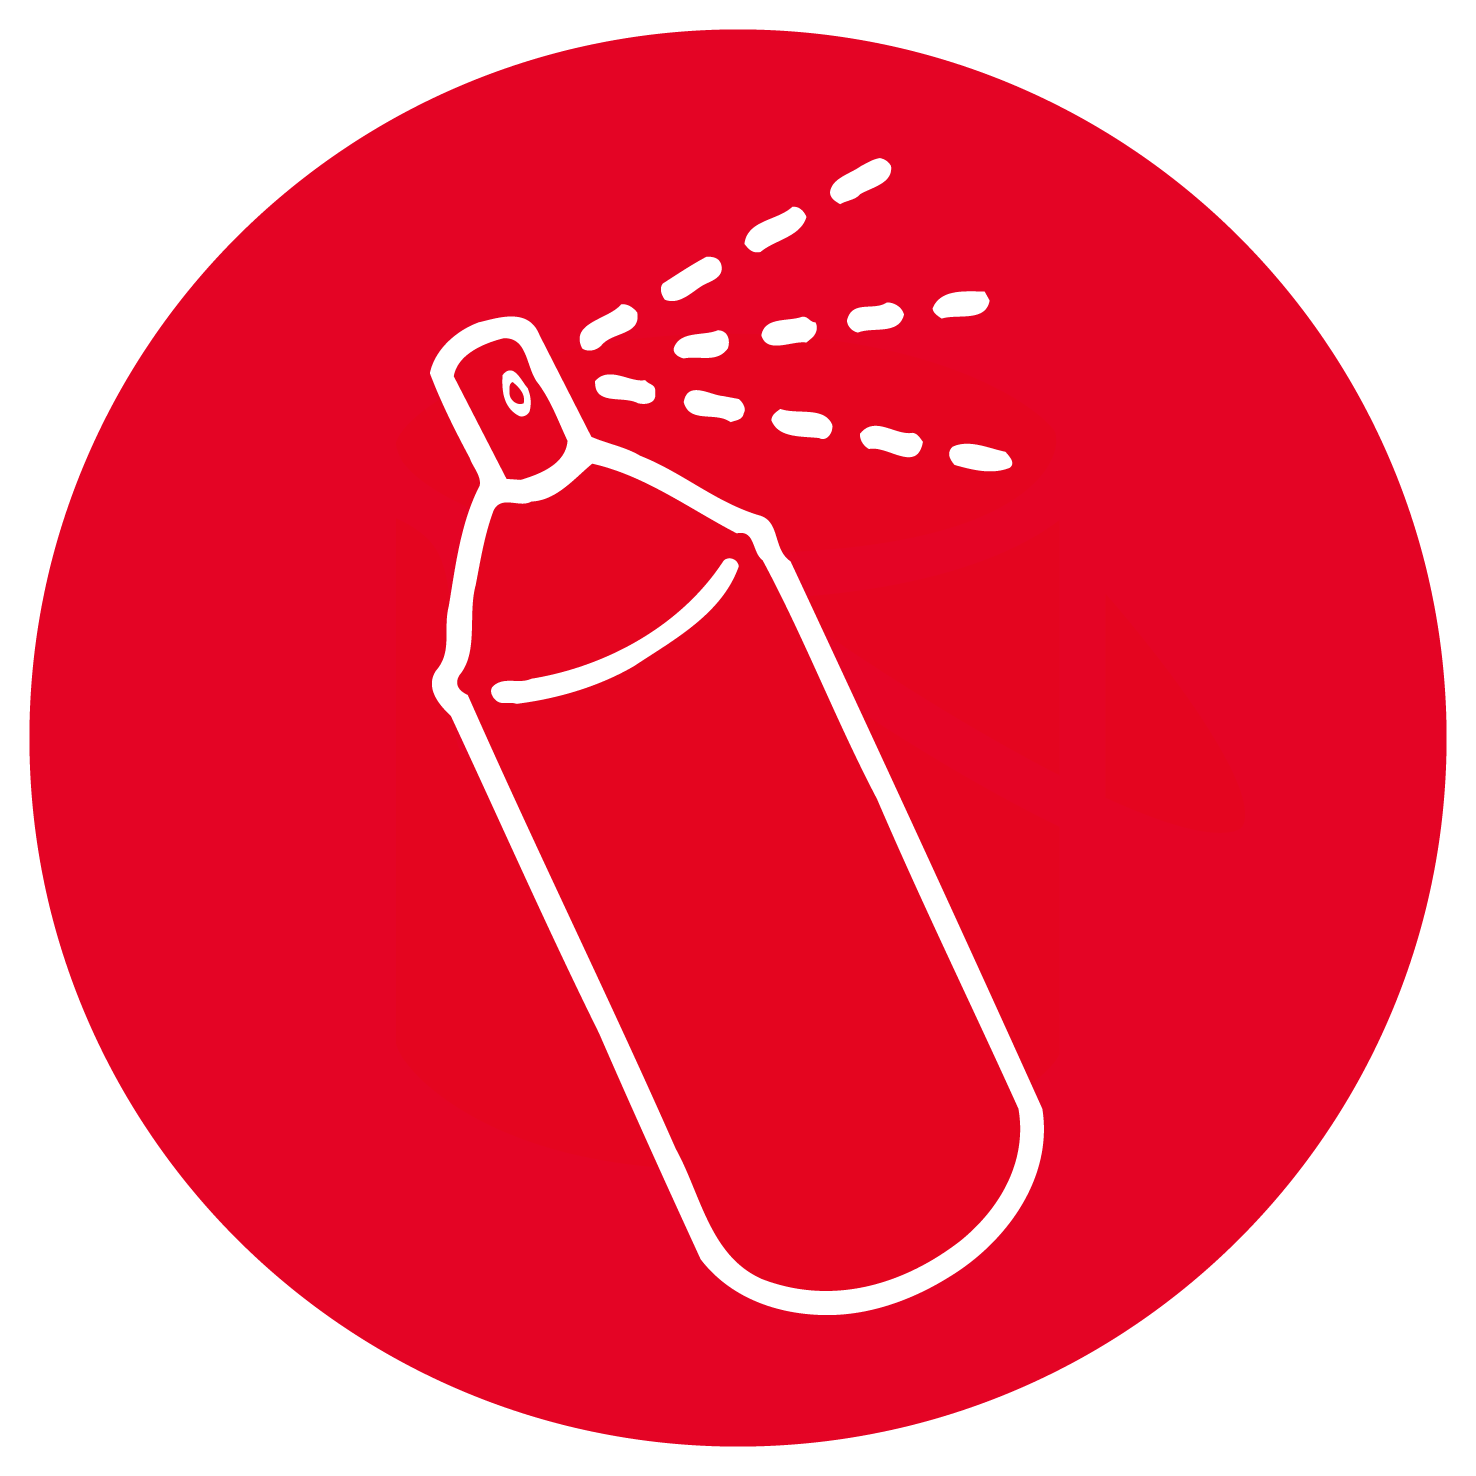 Spraybokser